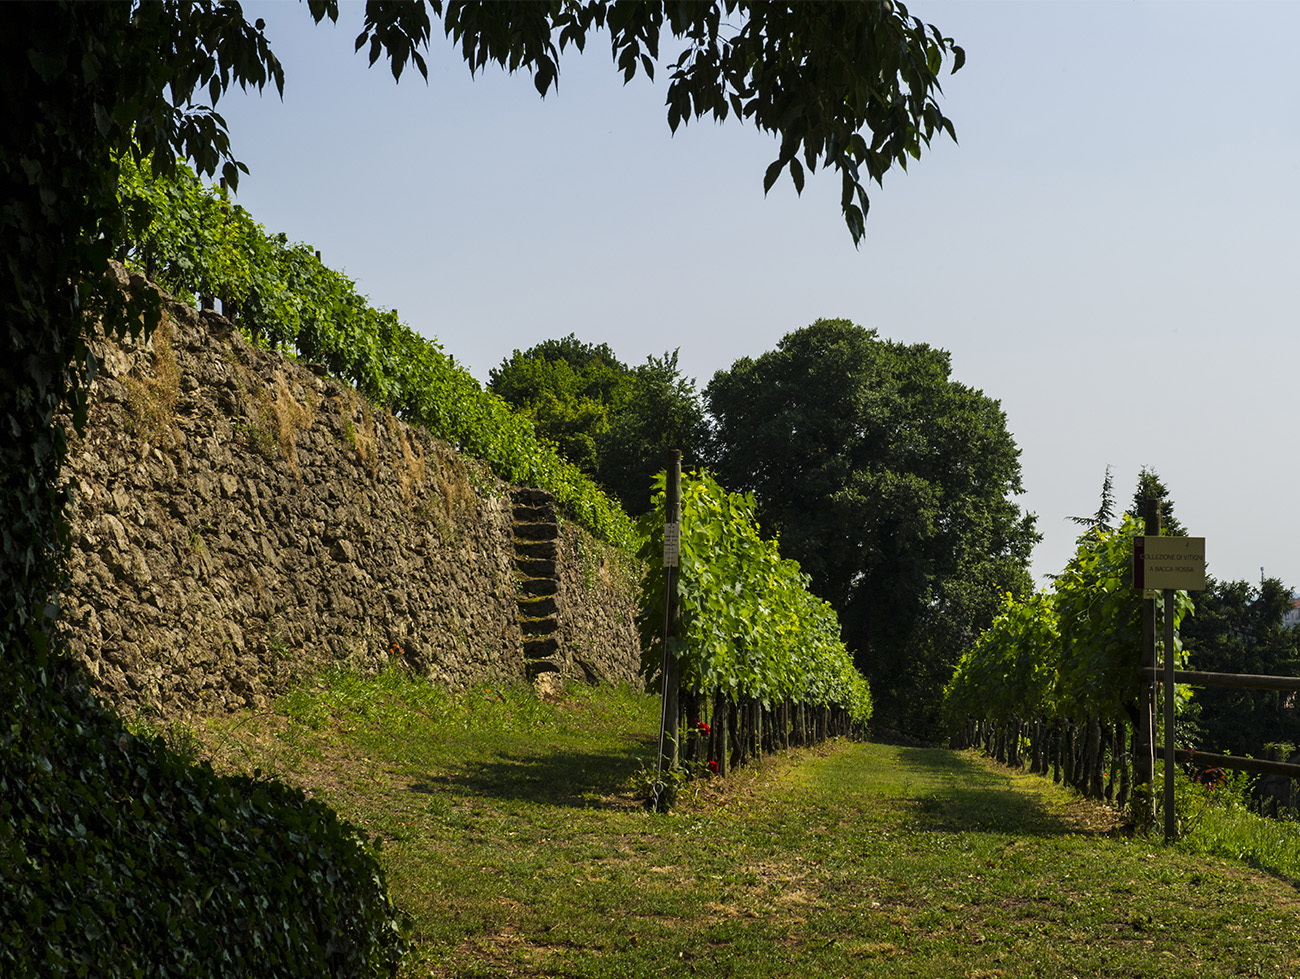 DSC_2023_terrazza_verde